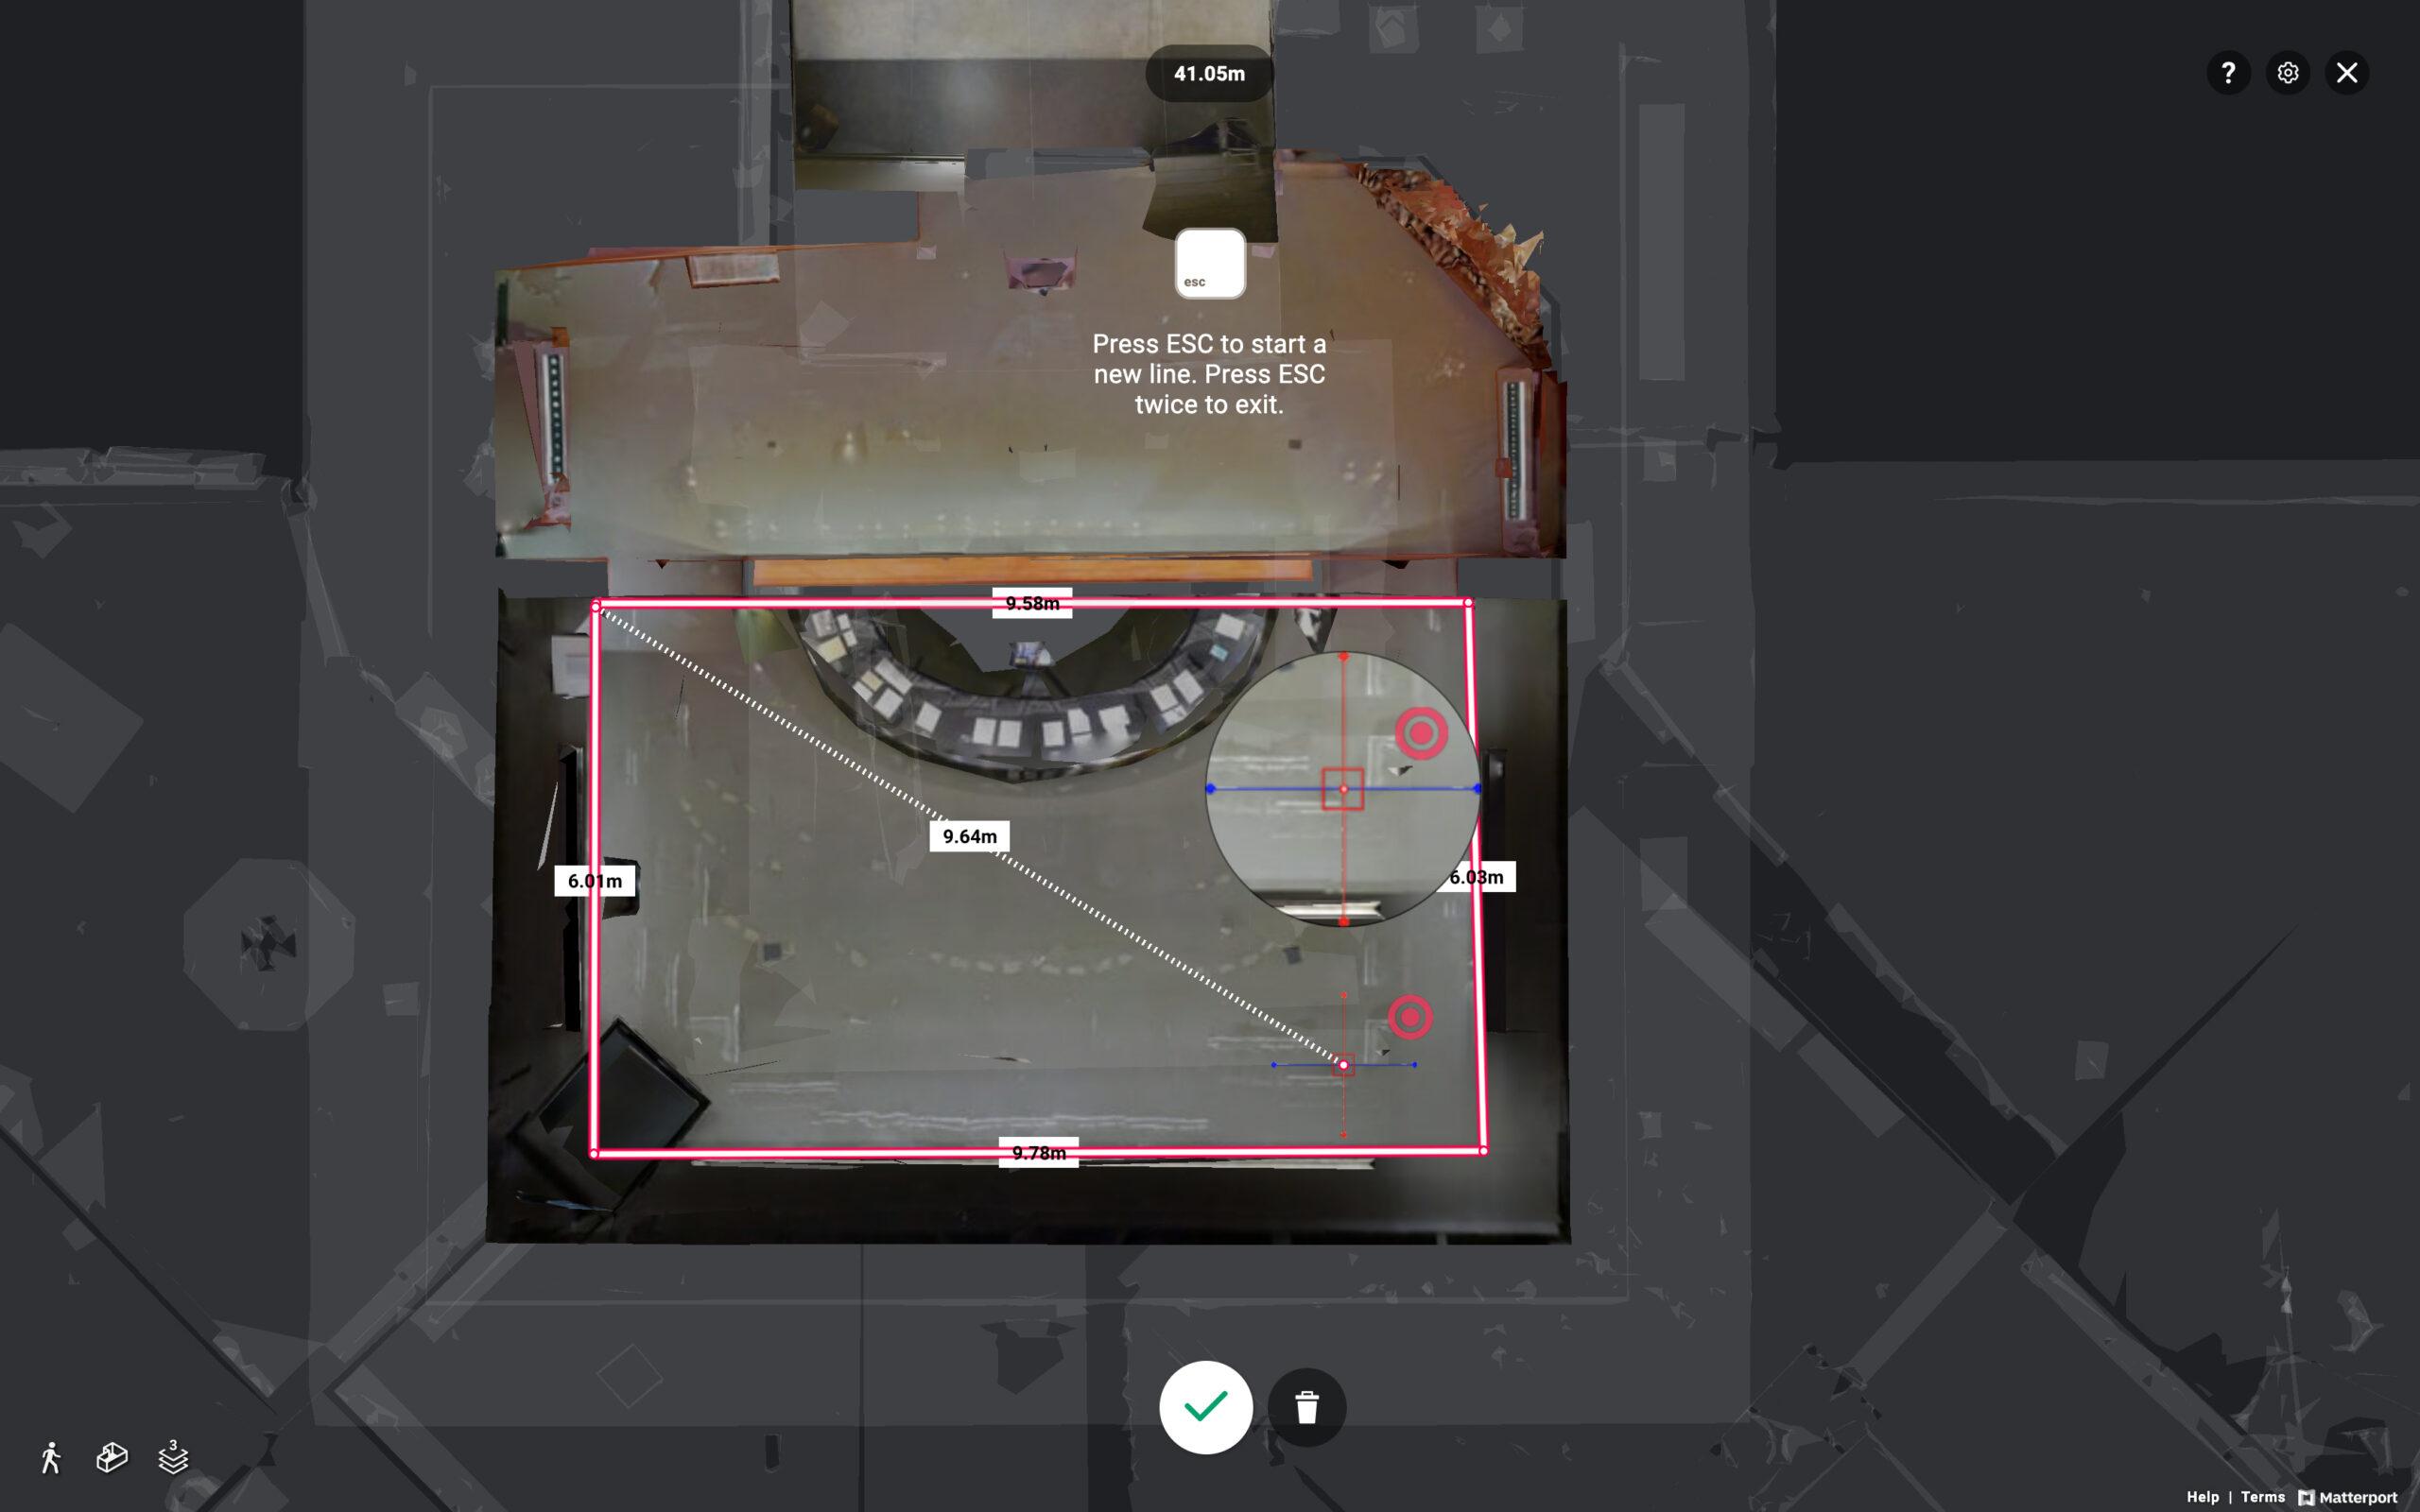 VR360 解決建築施工驗收,可精確量度空間長寬高